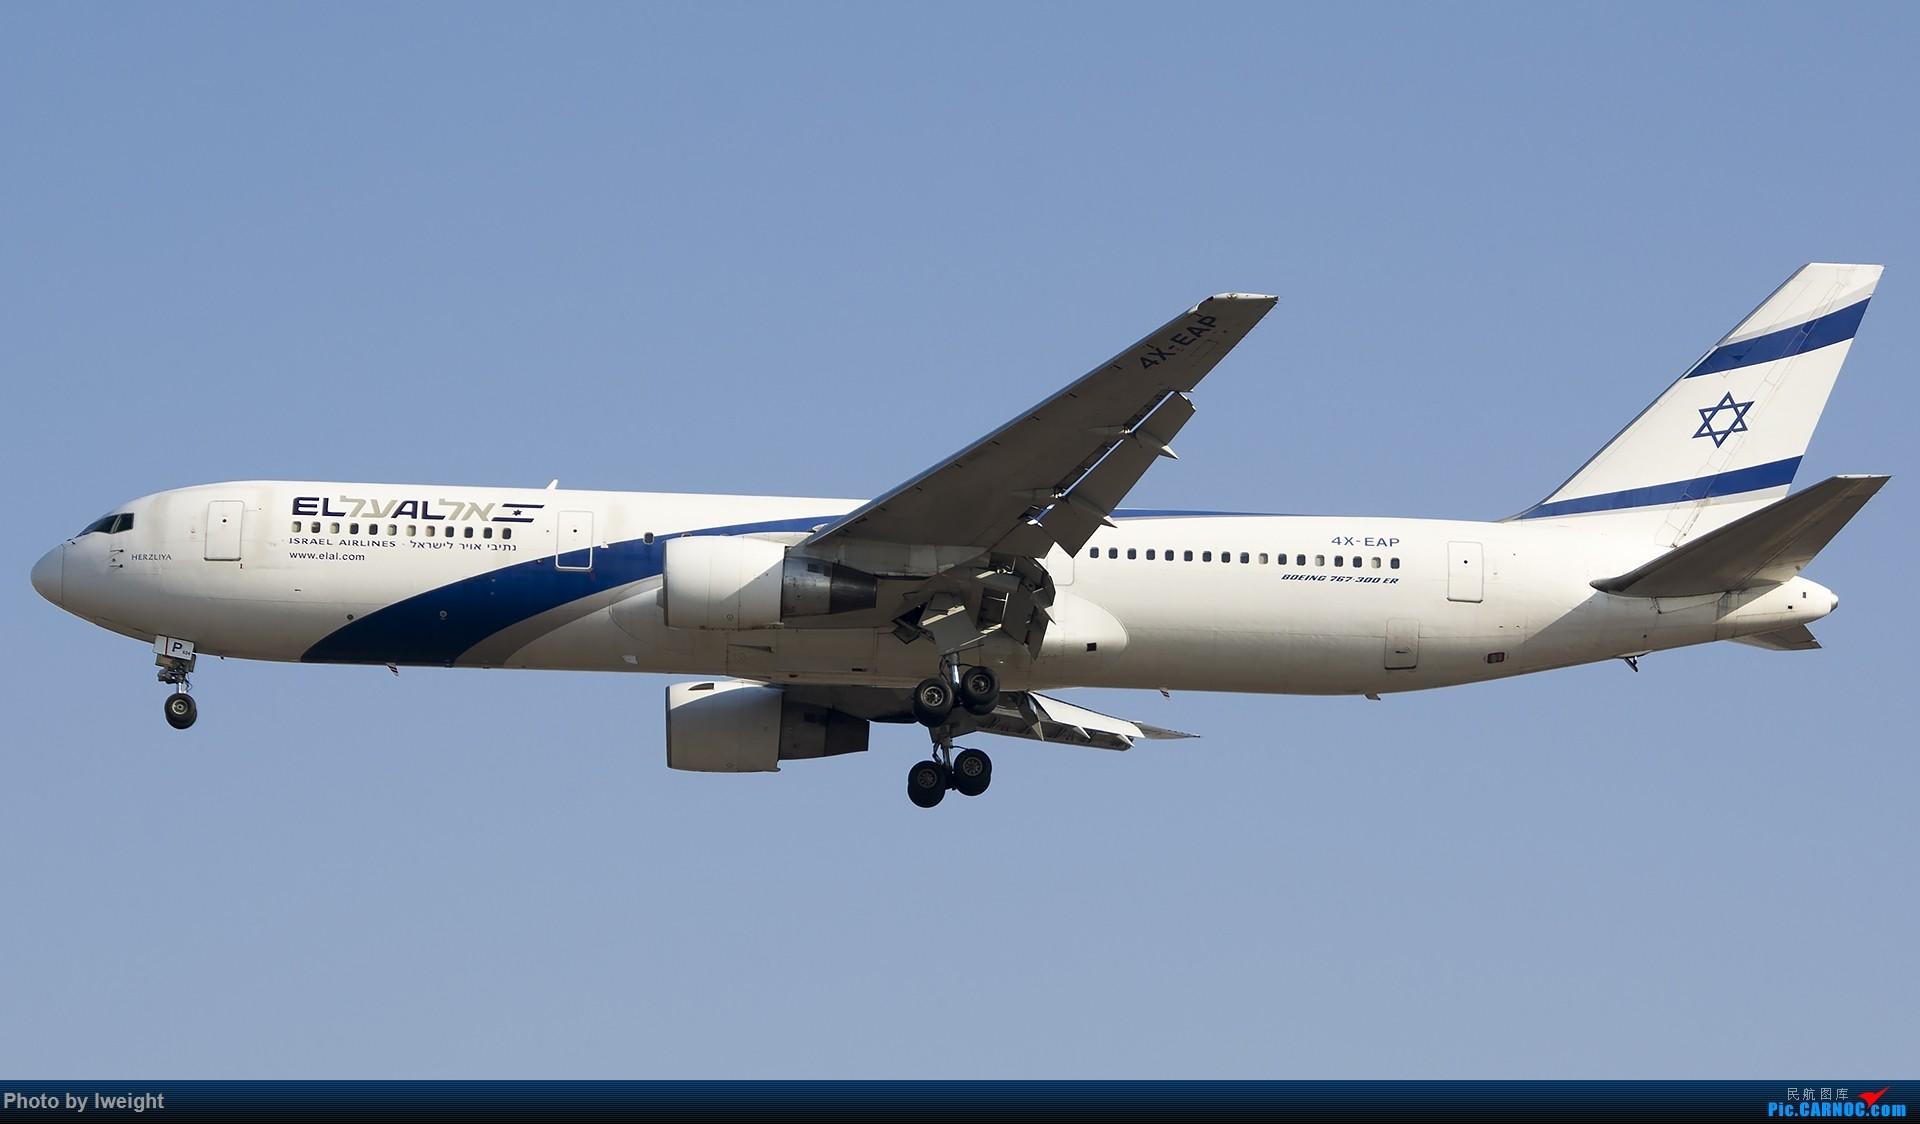 Re:[原创]2014-12-02 ZBAA随拍 BOEING 767-300ER 4X-EAP 中国北京首都国际机场